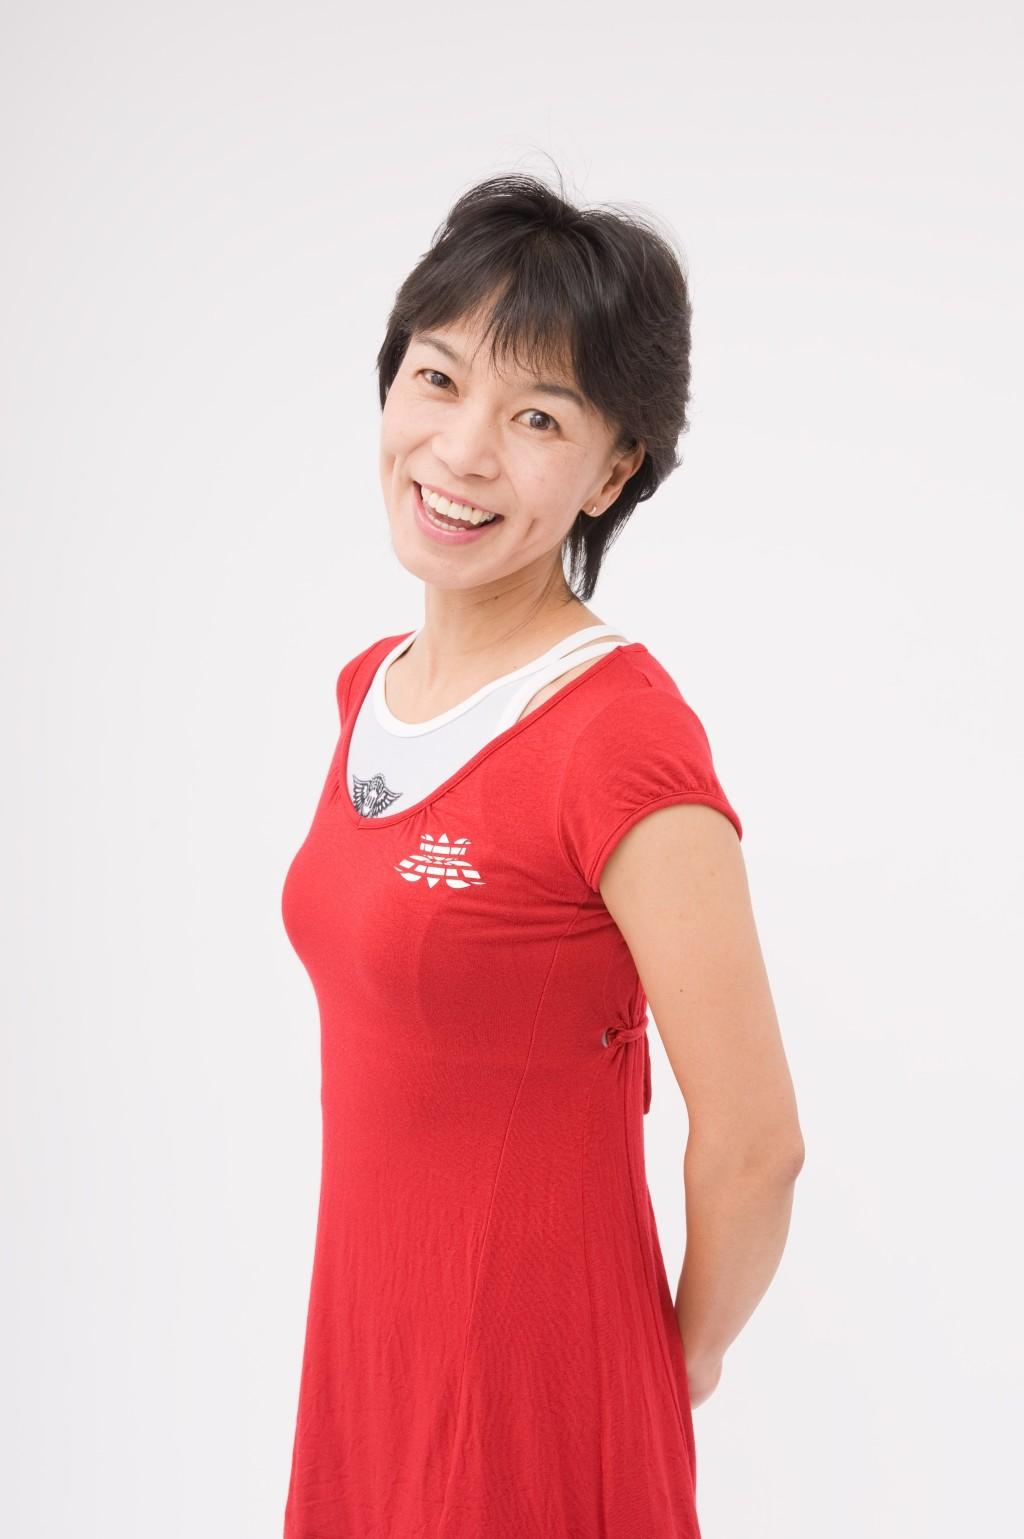 fujiwara akemi